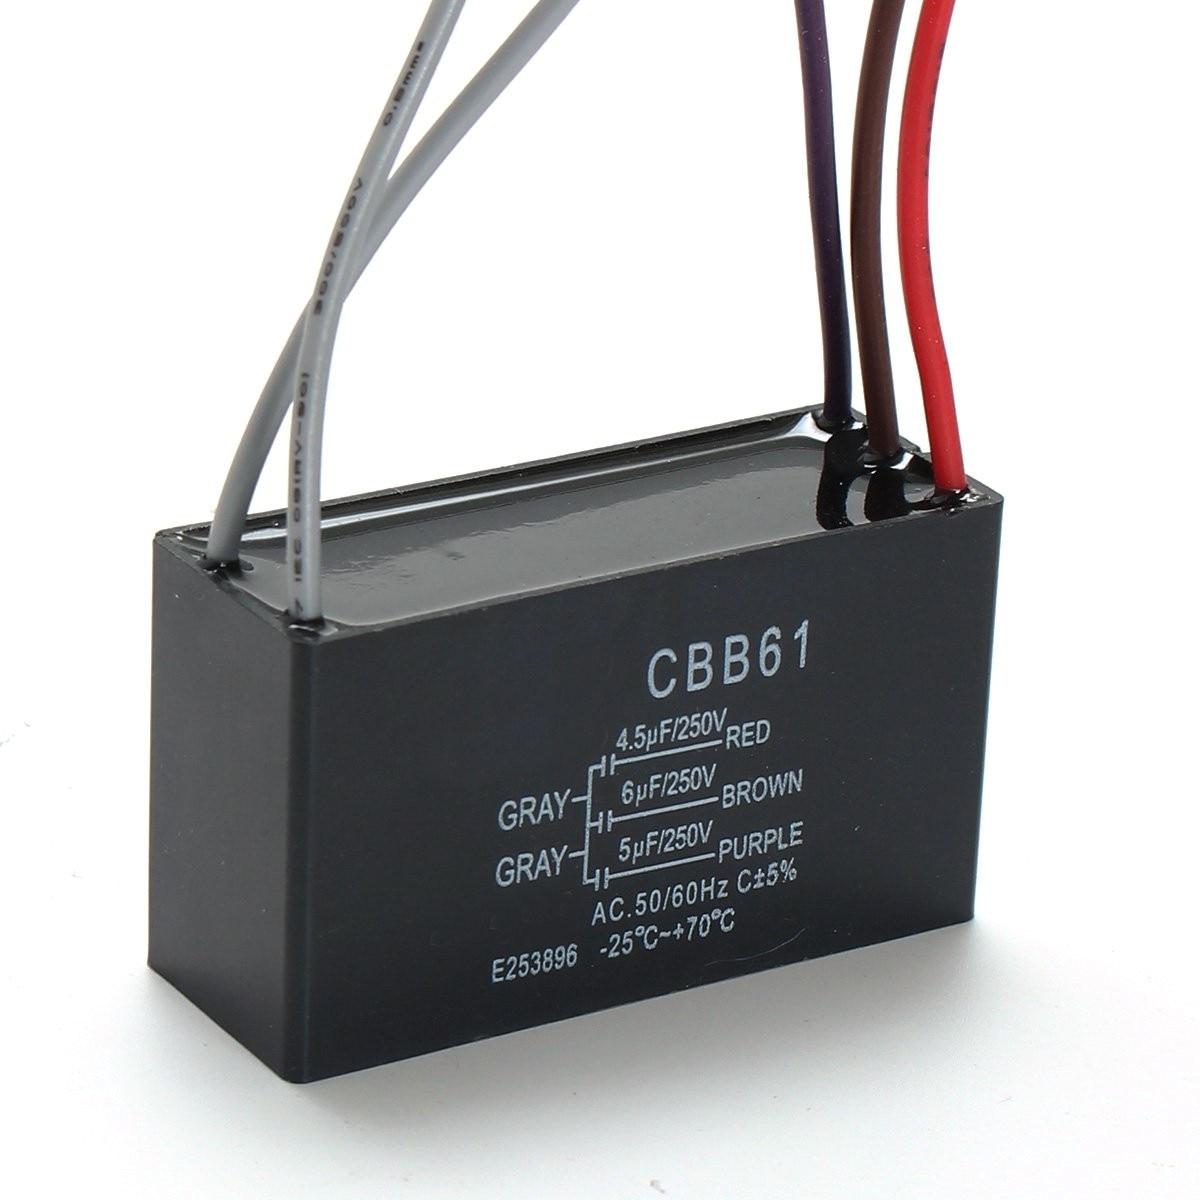 Niedlich Cbb61 Lüfter Kondensator 3 Draht Diagramm Galerie ...